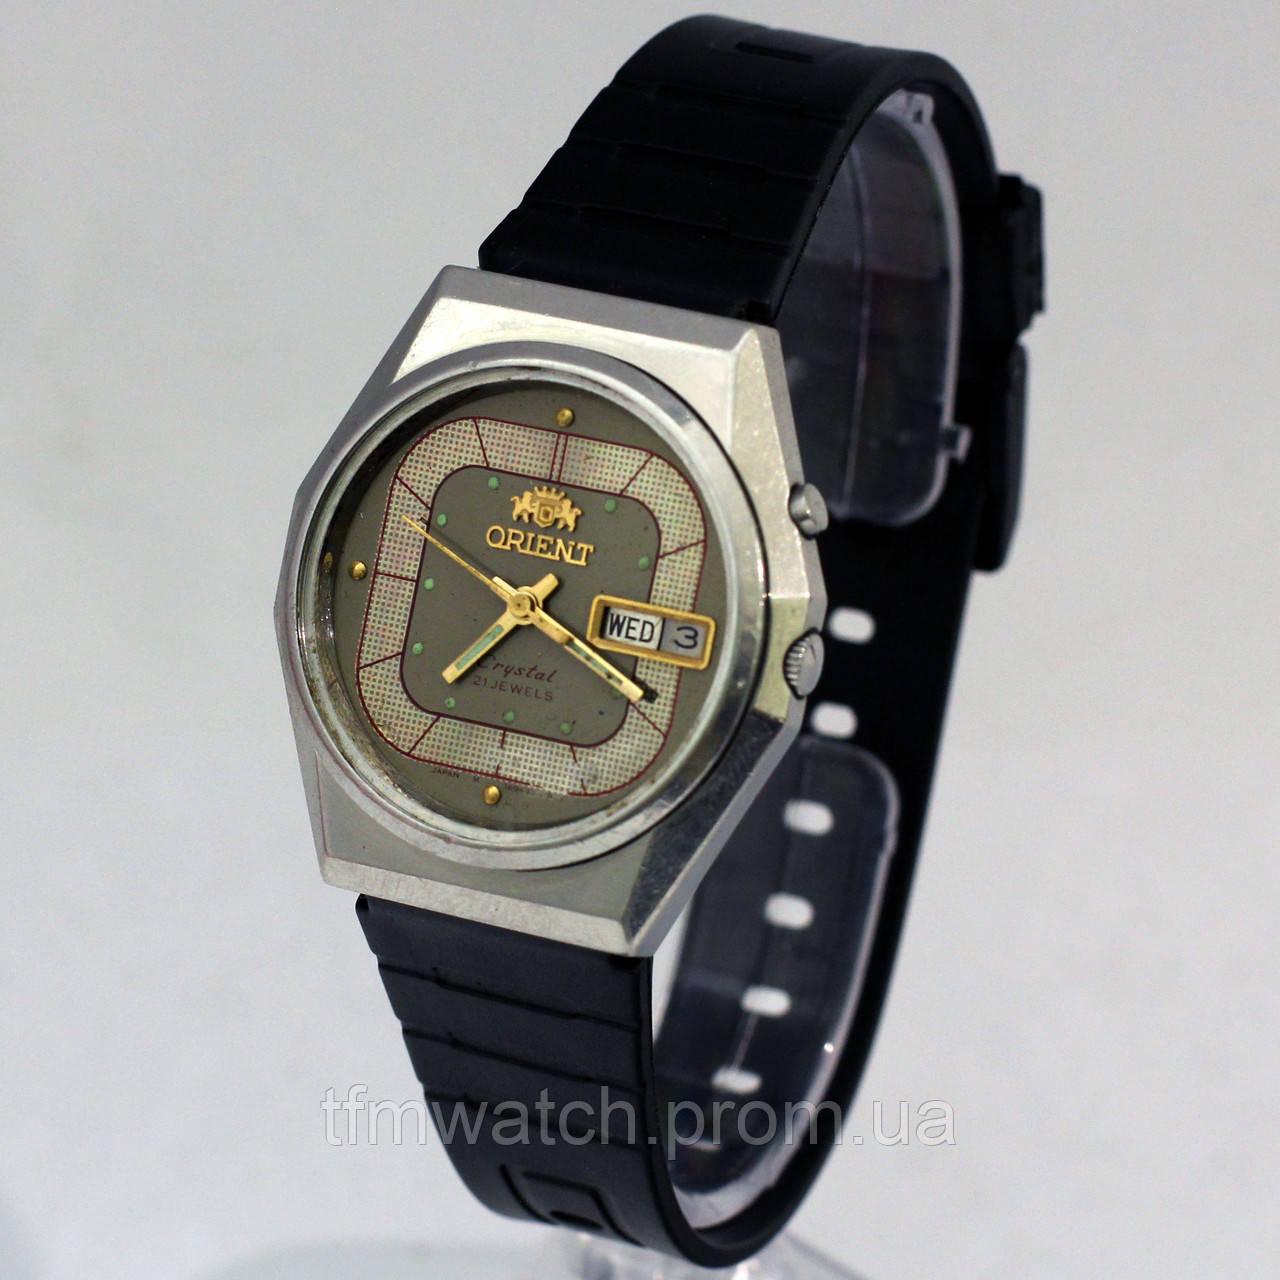 Часы Orient с двойным календарем